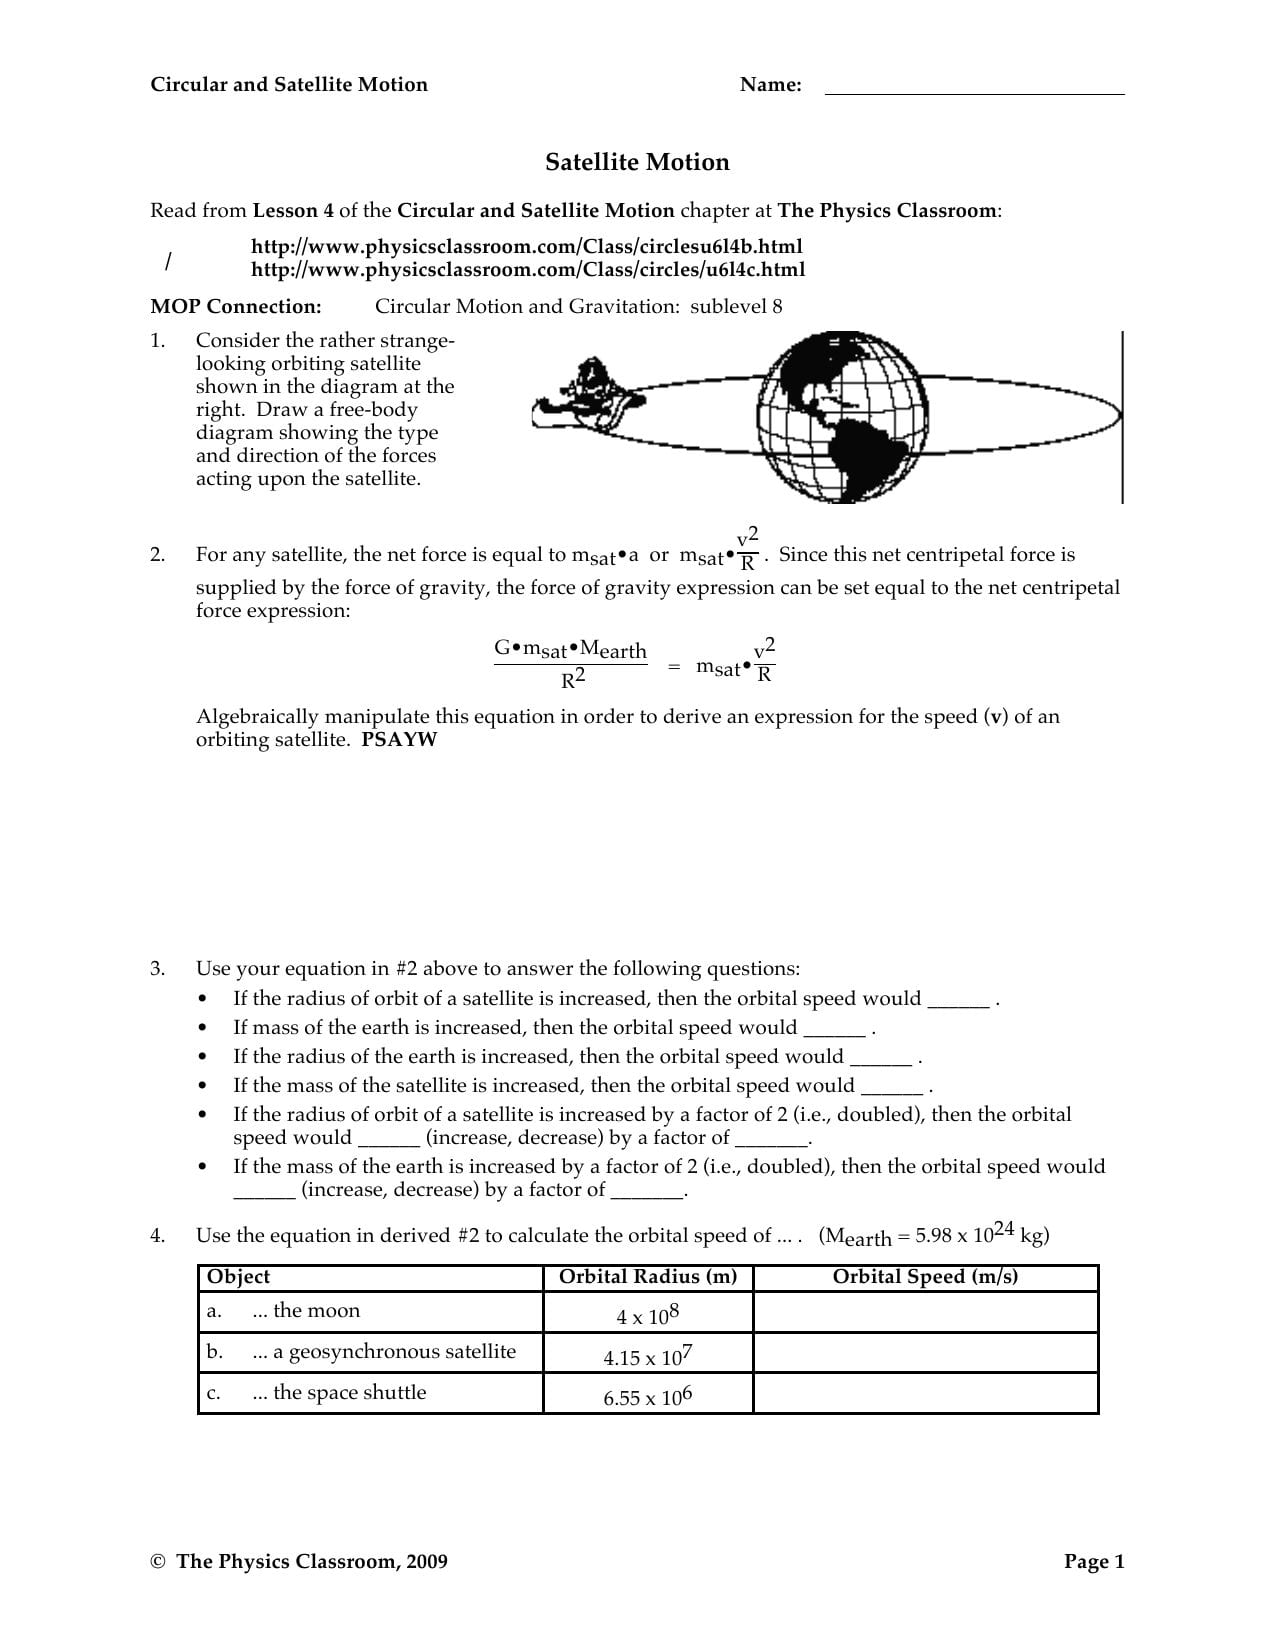 Circular And Satellite Motion Worksheet Answers